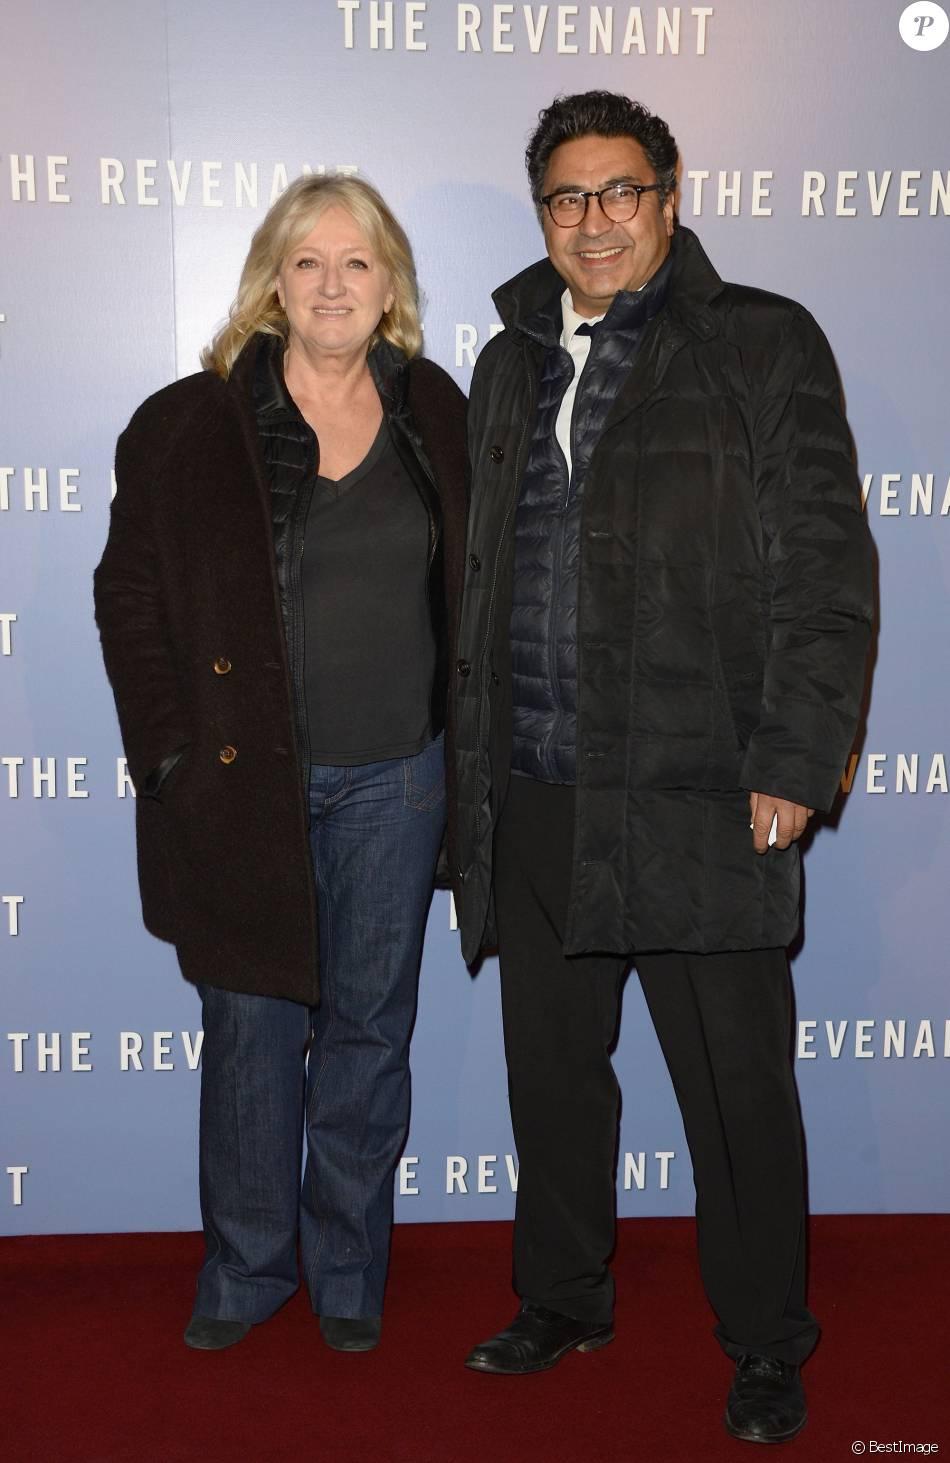 Charlotte de turckheim et son mari zaman hachemi avant premi re du film the revenant au grand - Charlotte de turckheim et son mari ...